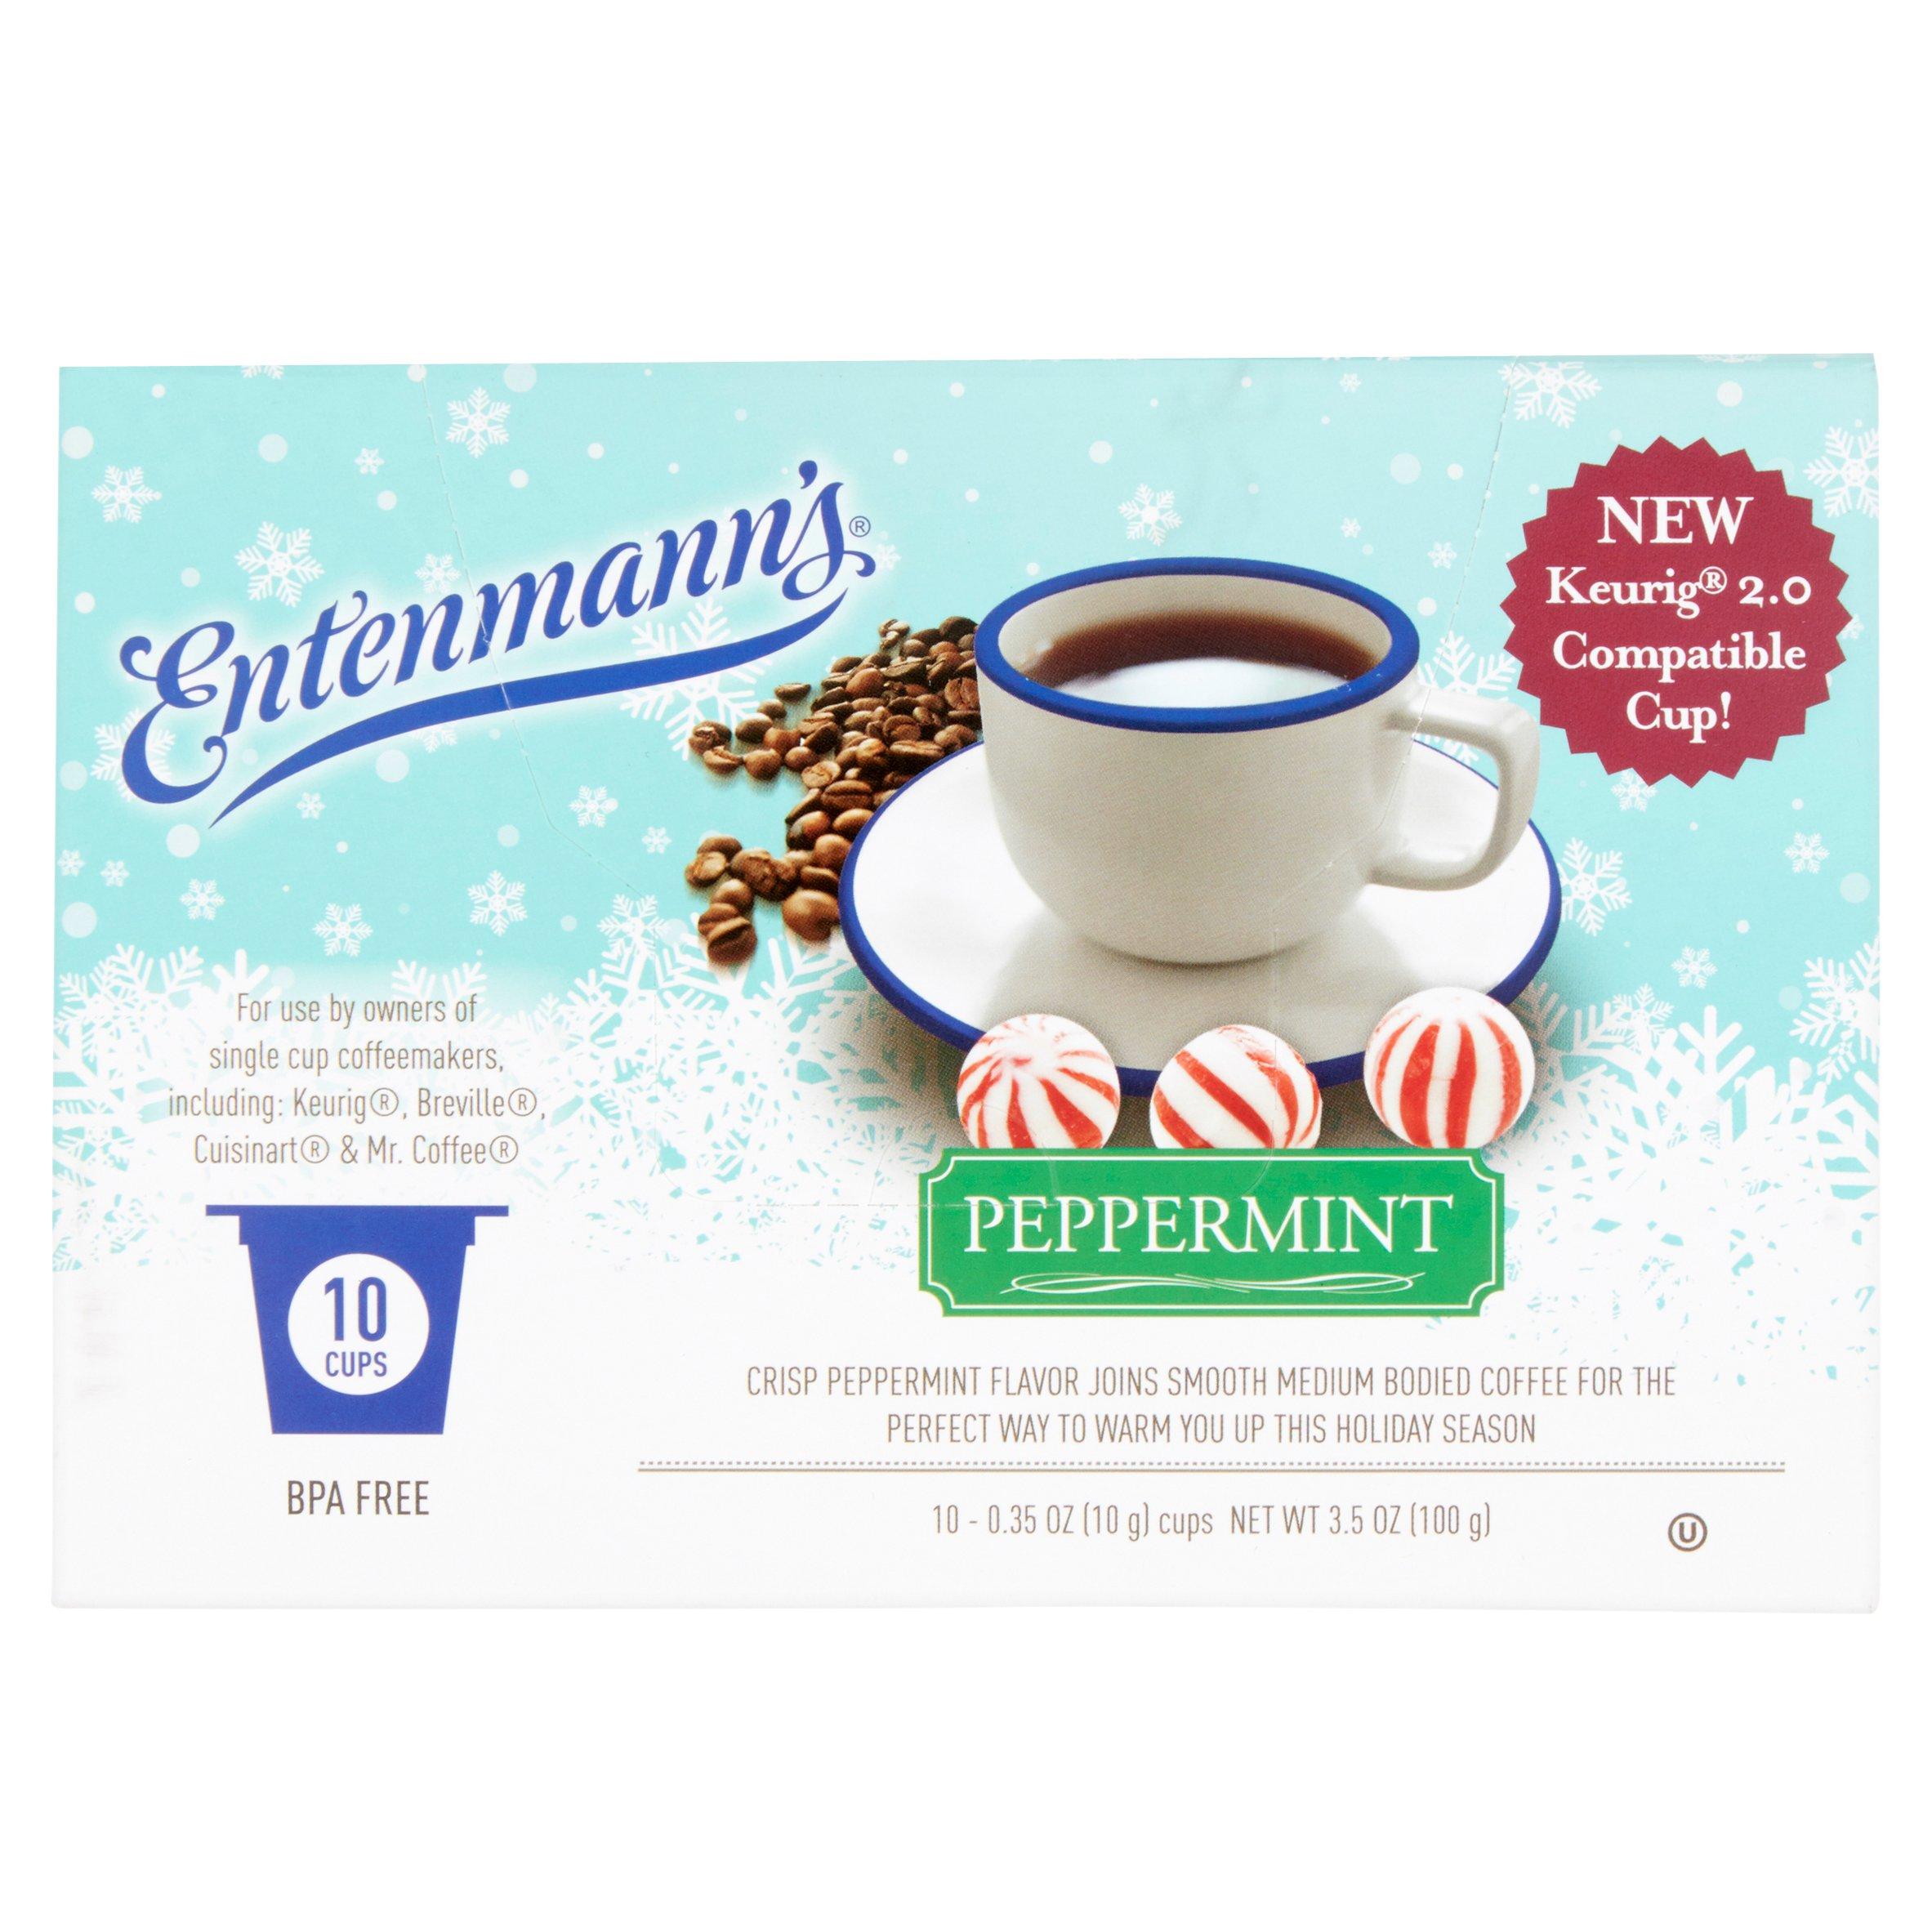 Entenmann's Peppermint Coffee, 0.35 oz, 10 count